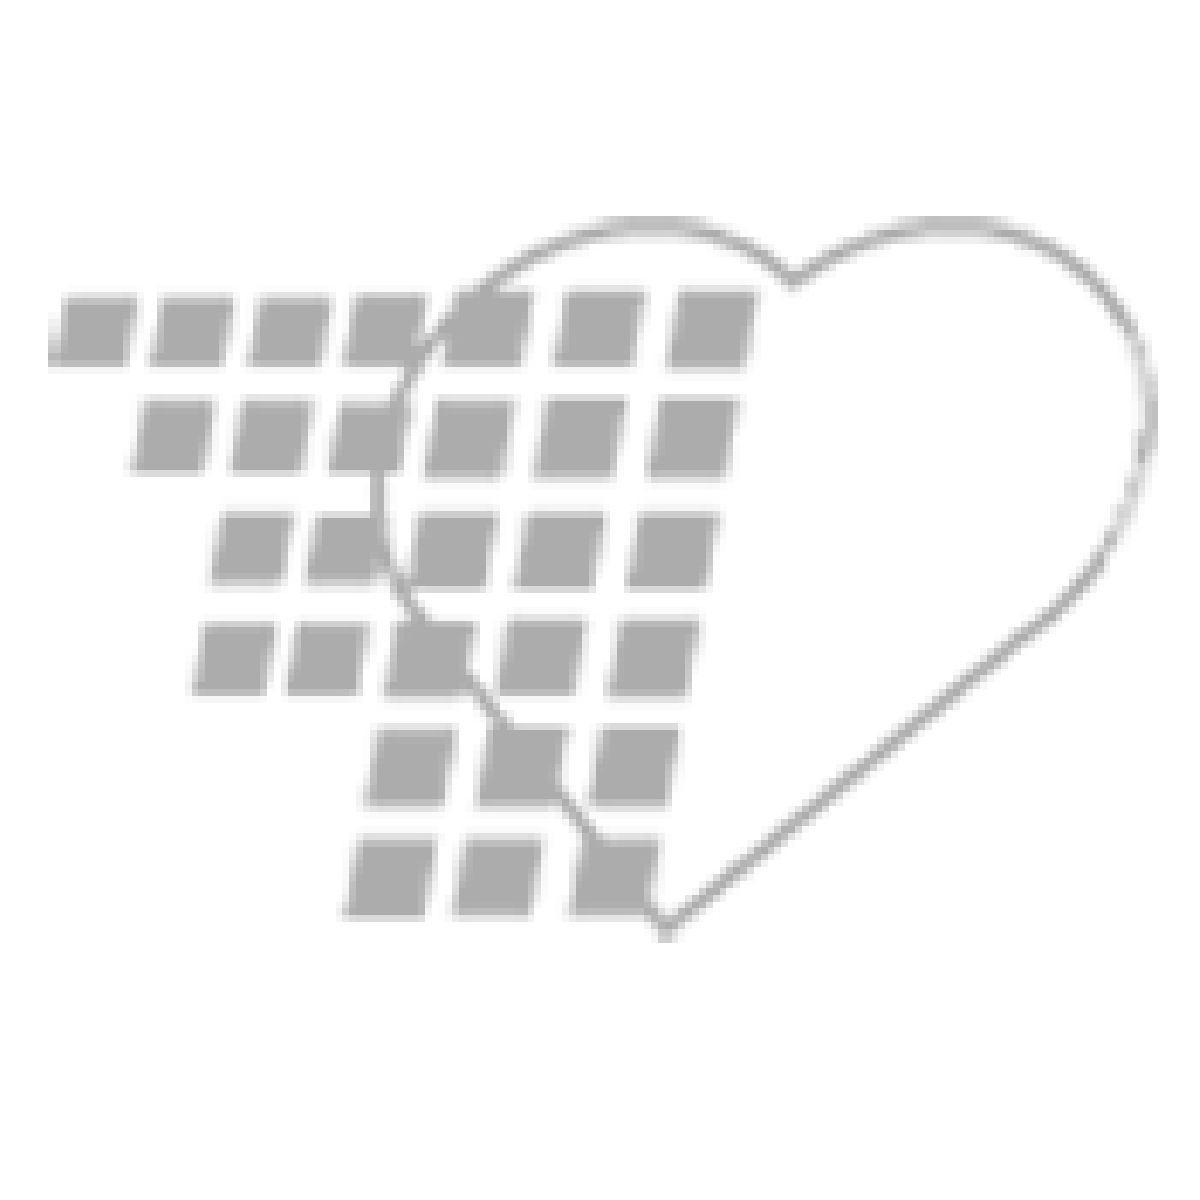 06-93-9031 - Demo Dose® Captoprl (Capotn) 25 mg - 100/Bottle